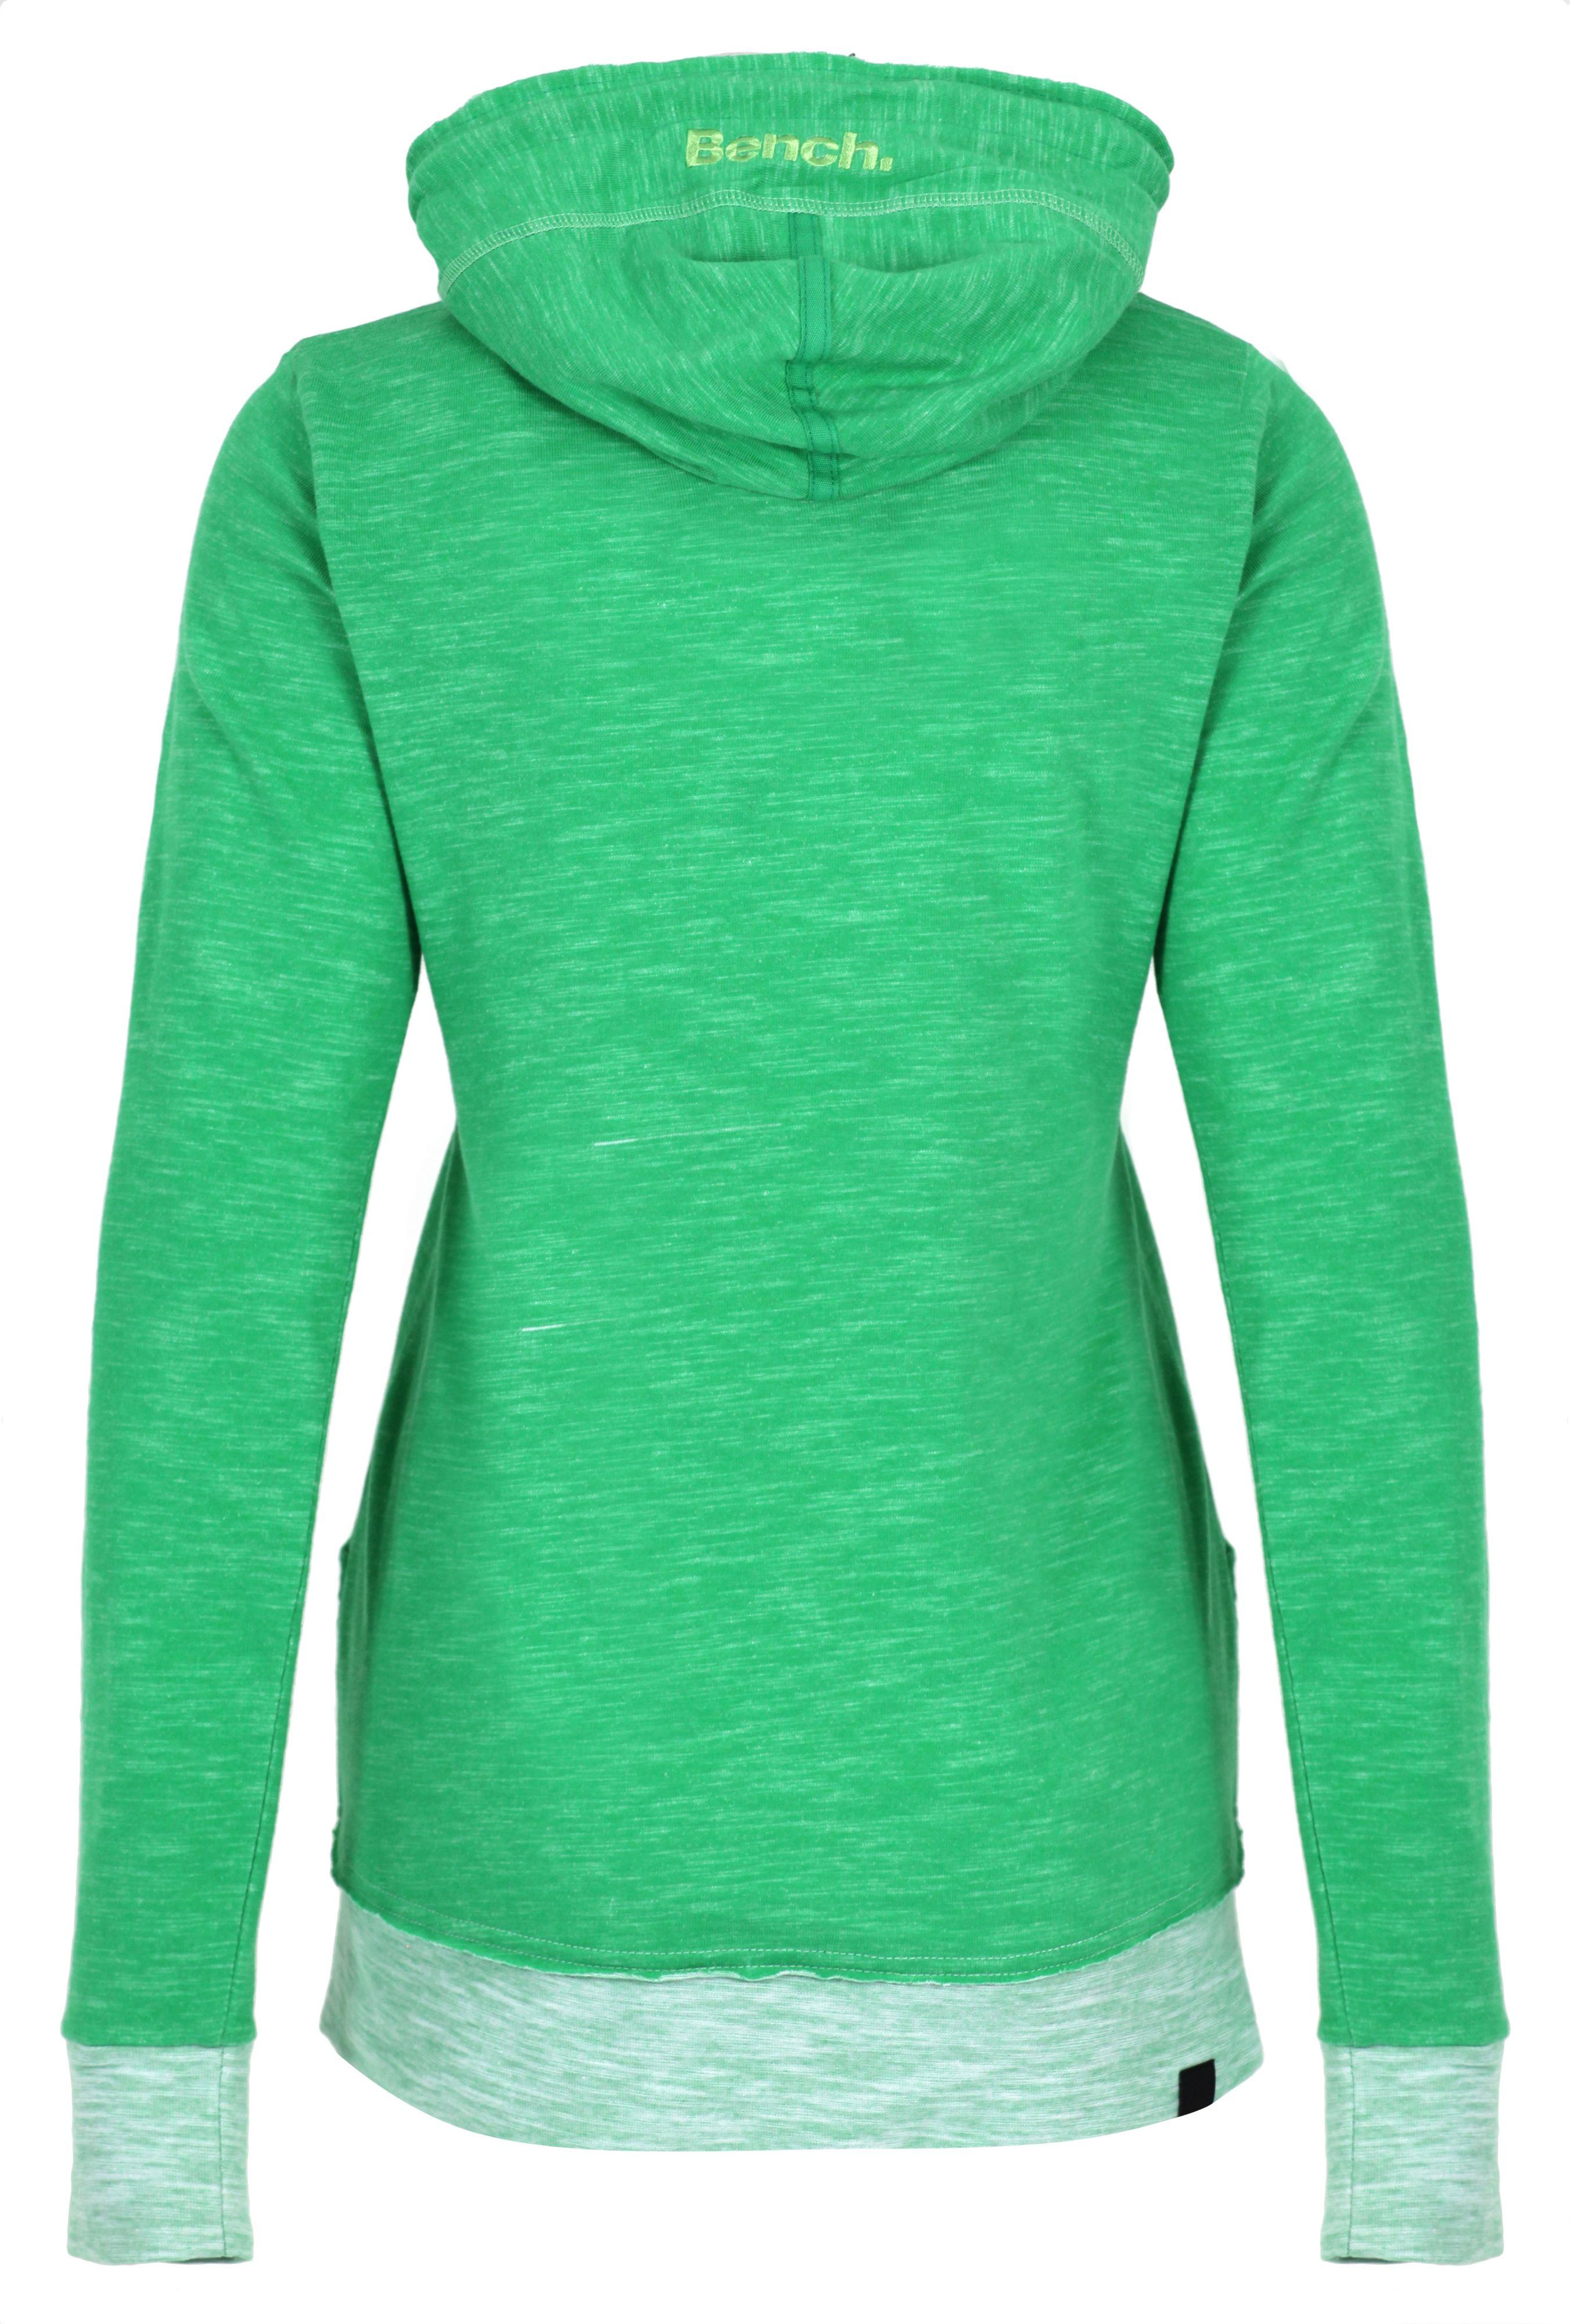 Womens Green Bay Packers Shirts